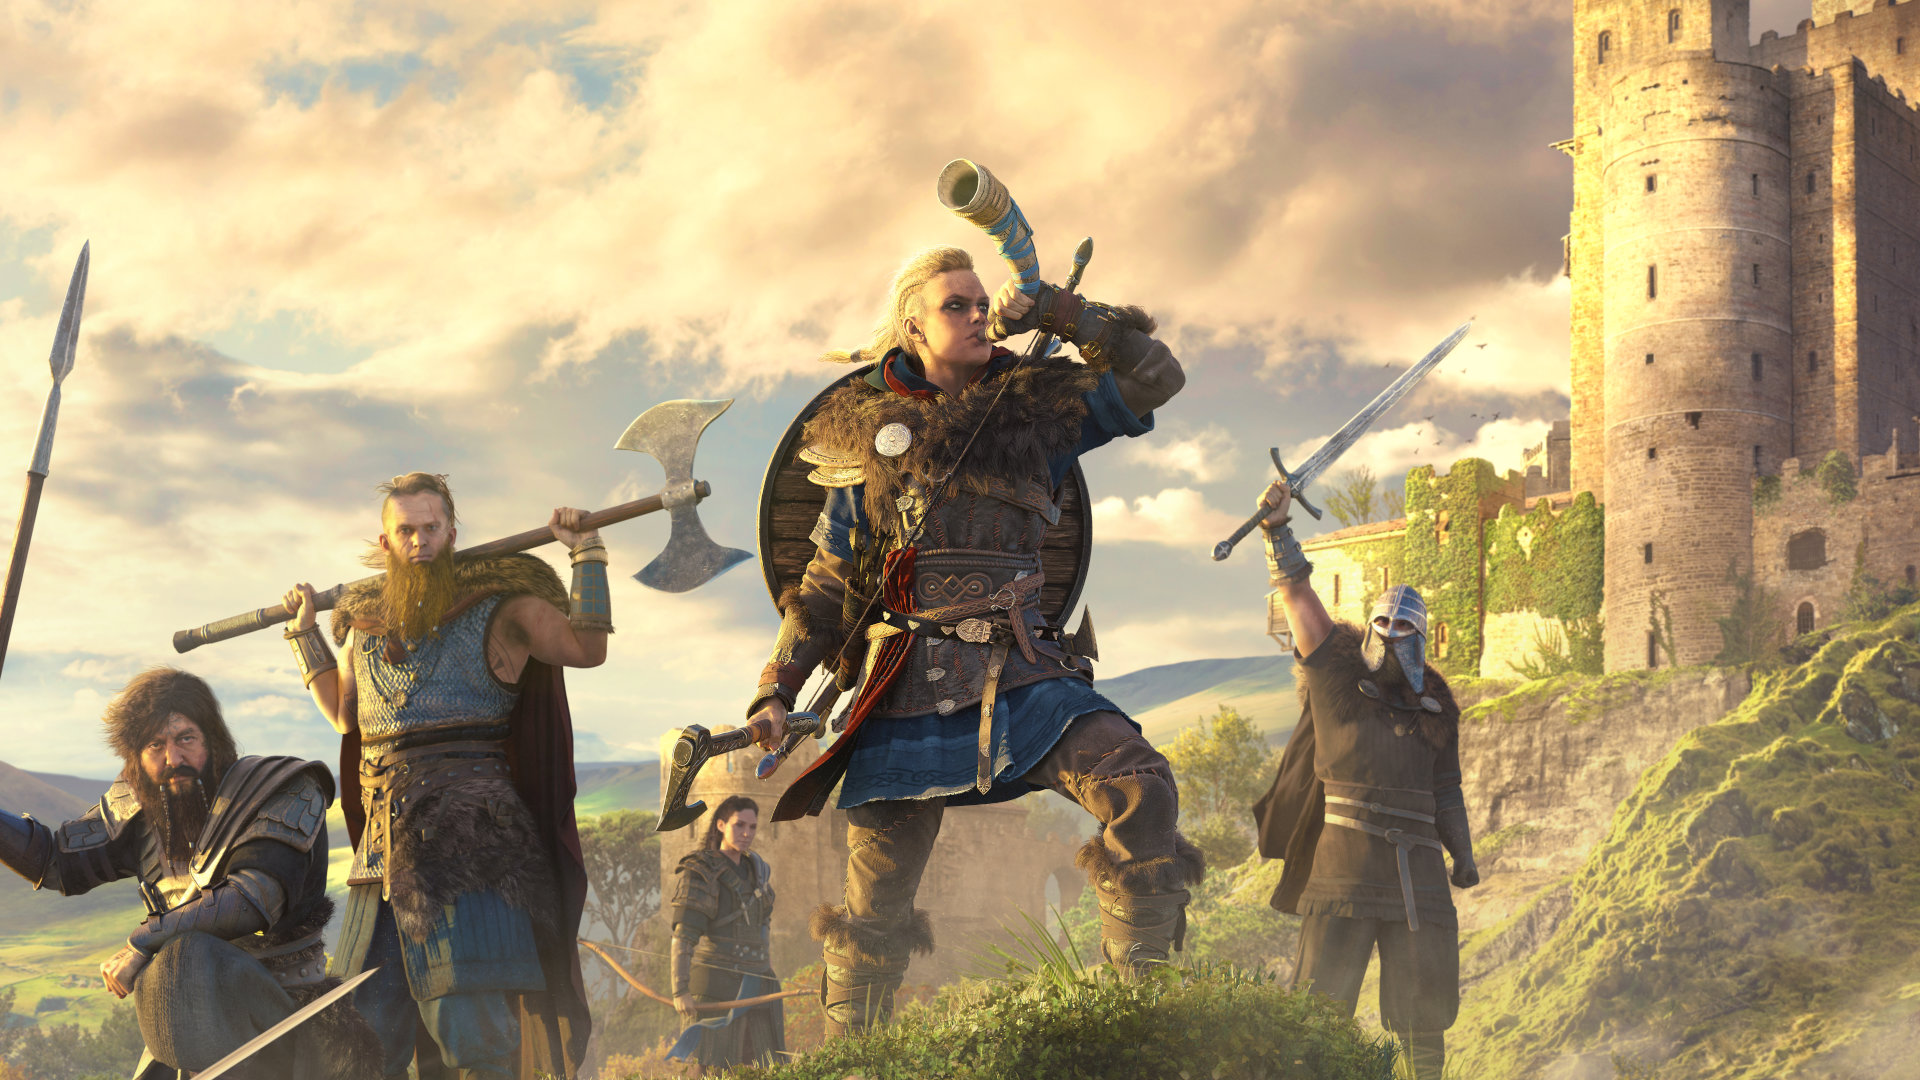 Představen post-launch obsah pro hru Assassin's Creed: Valhalla